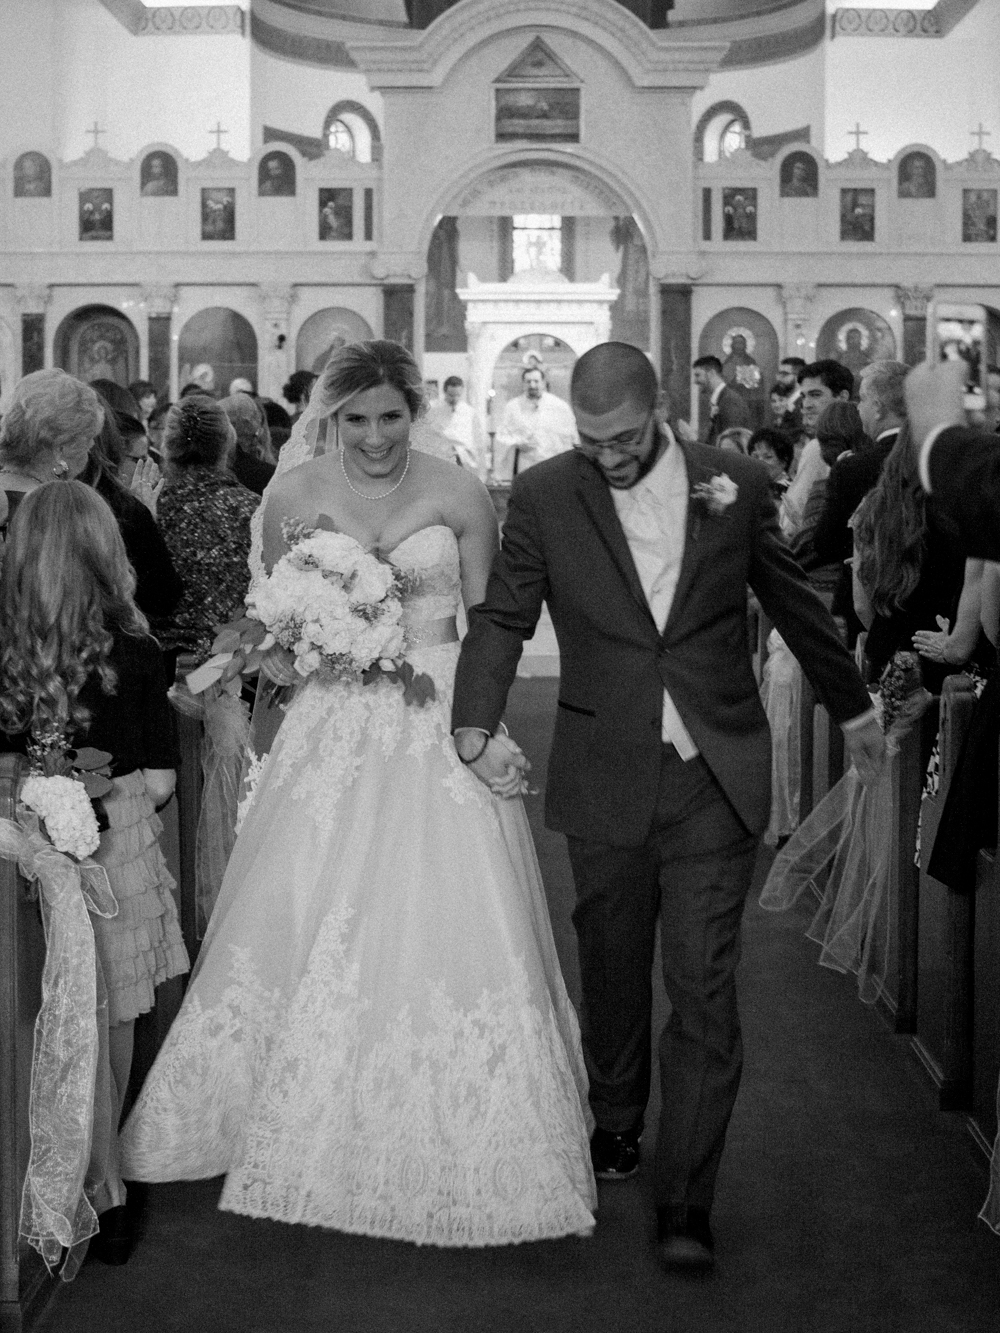 Houston wedding photographer - Christine Gosch - Houston film photographer - greek wedding in Houston - Annunciation Greek Orthodox church in Houston, Texas - Houston wedding planner -33.jpg